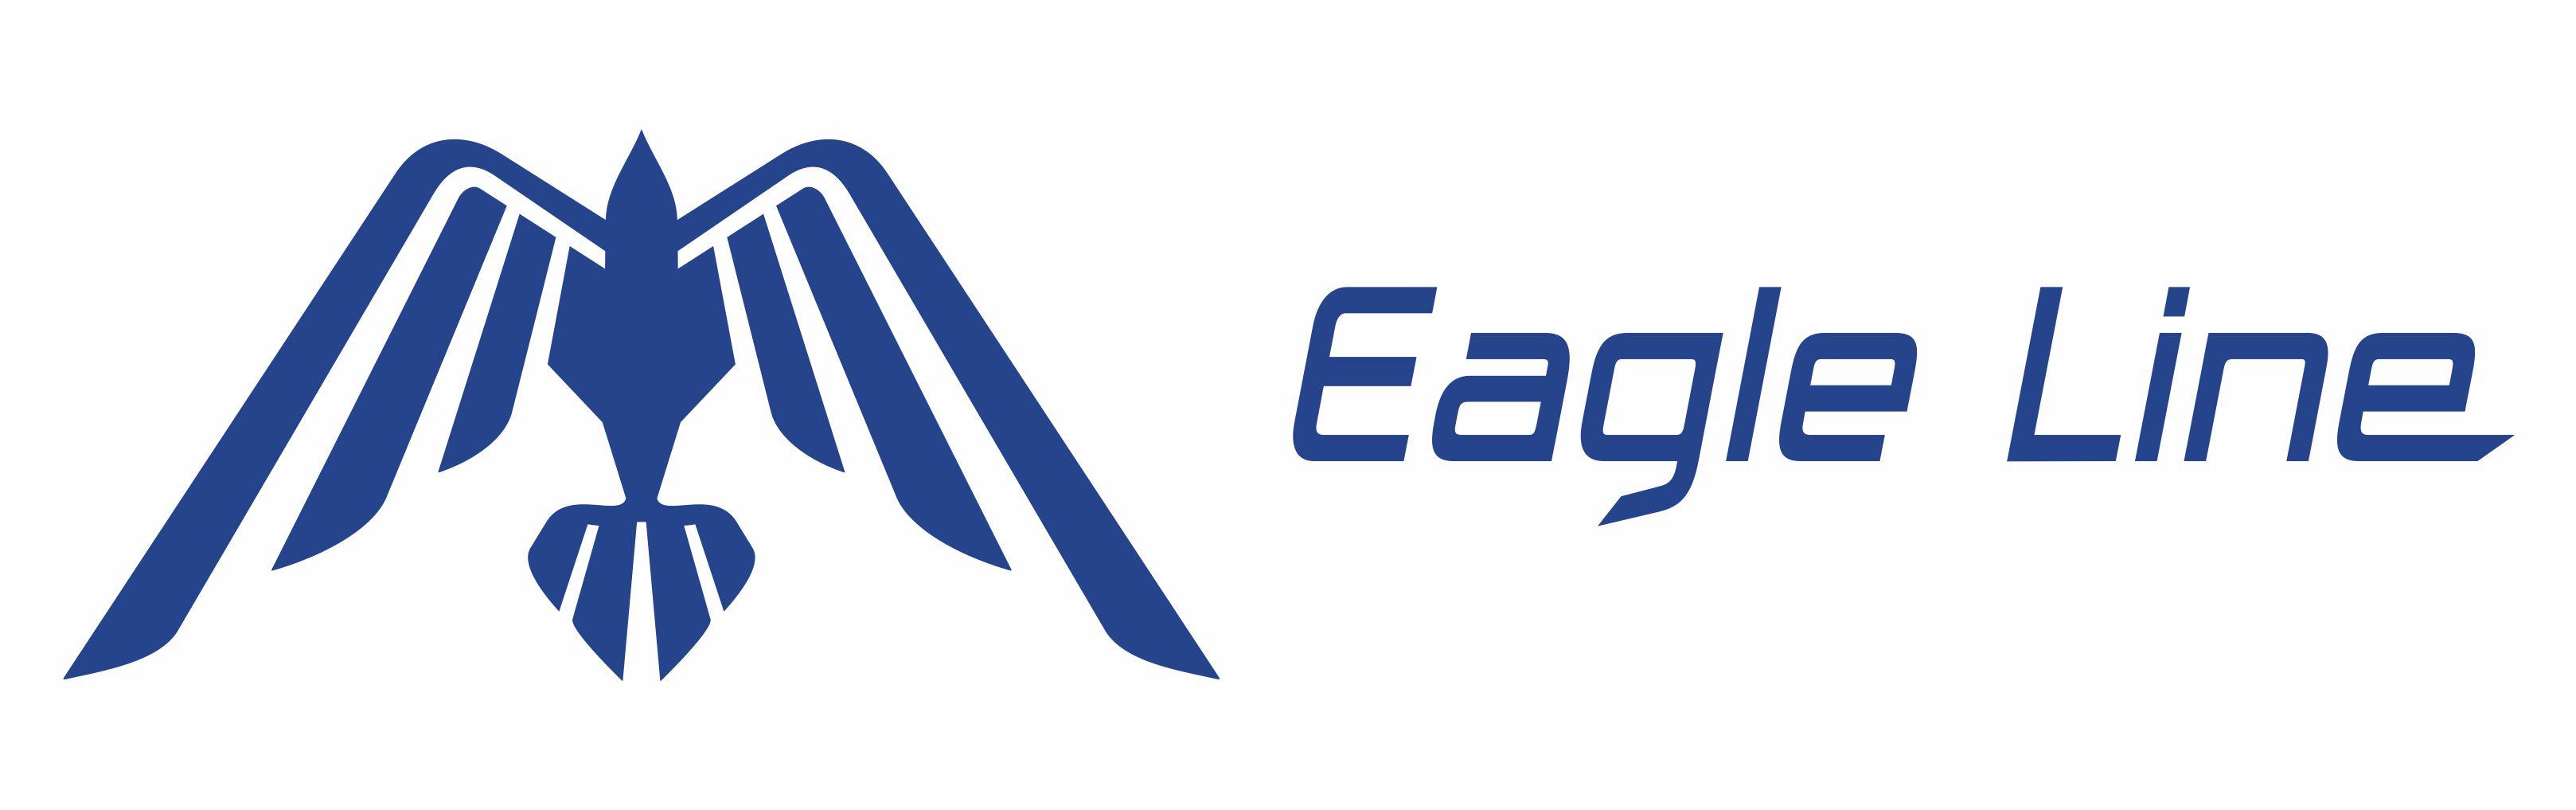 3M EAGLE Line 2019